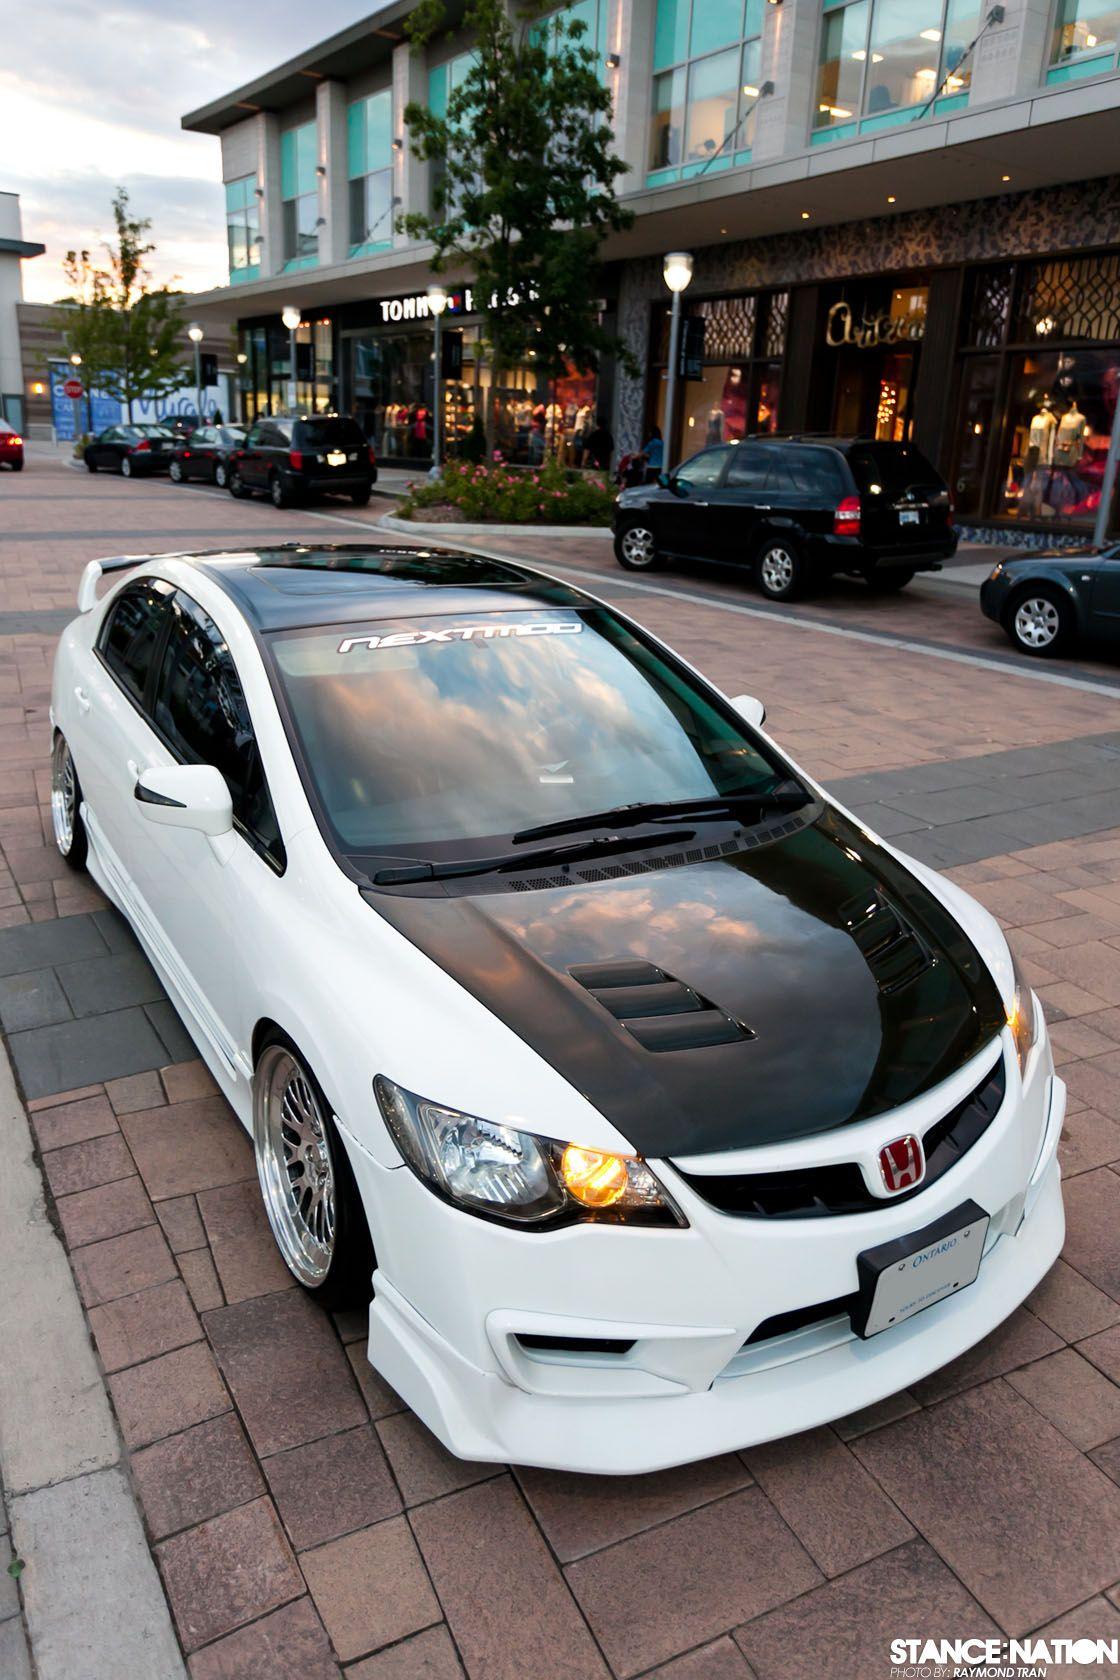 2006 Honda Civic Custom : honda, civic, custom, Properly, Reppin', Toronto!, StanceNation™, Function, Honda, Civic, Civic,